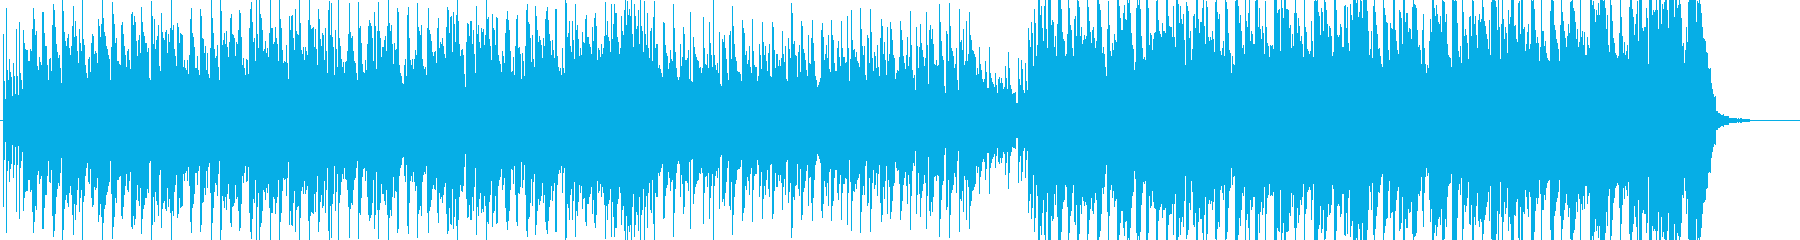 【CM, アニメ】楽しいアミューズメントの再生済みの波形